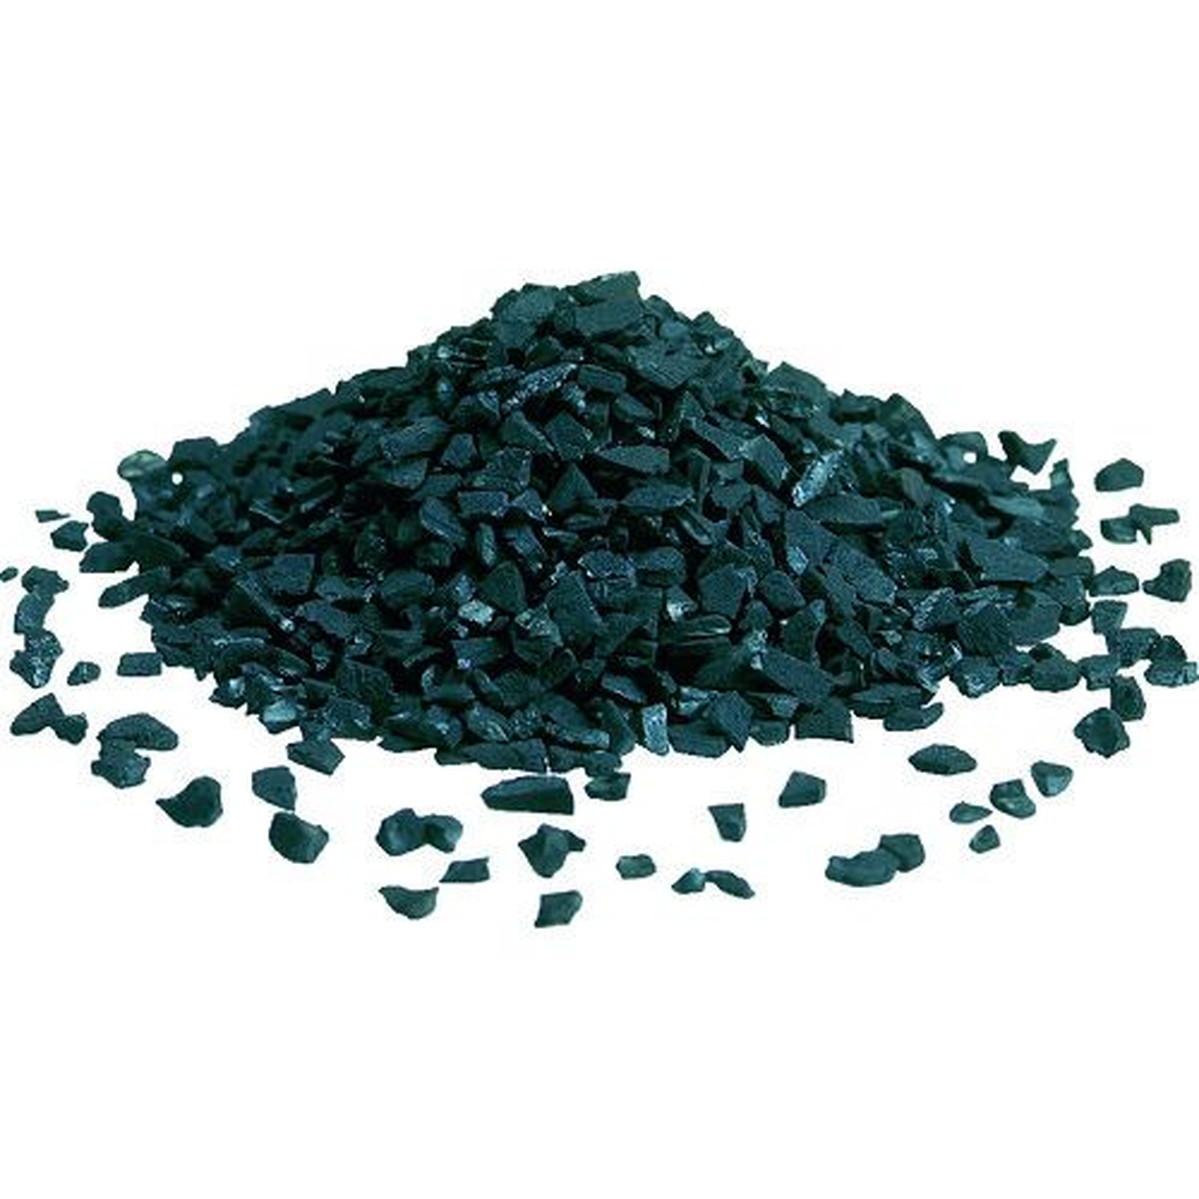 あす楽対応 DIY用品 UES 活力炭粒状 5kgX4袋入 絶品 1箱 大放出セール